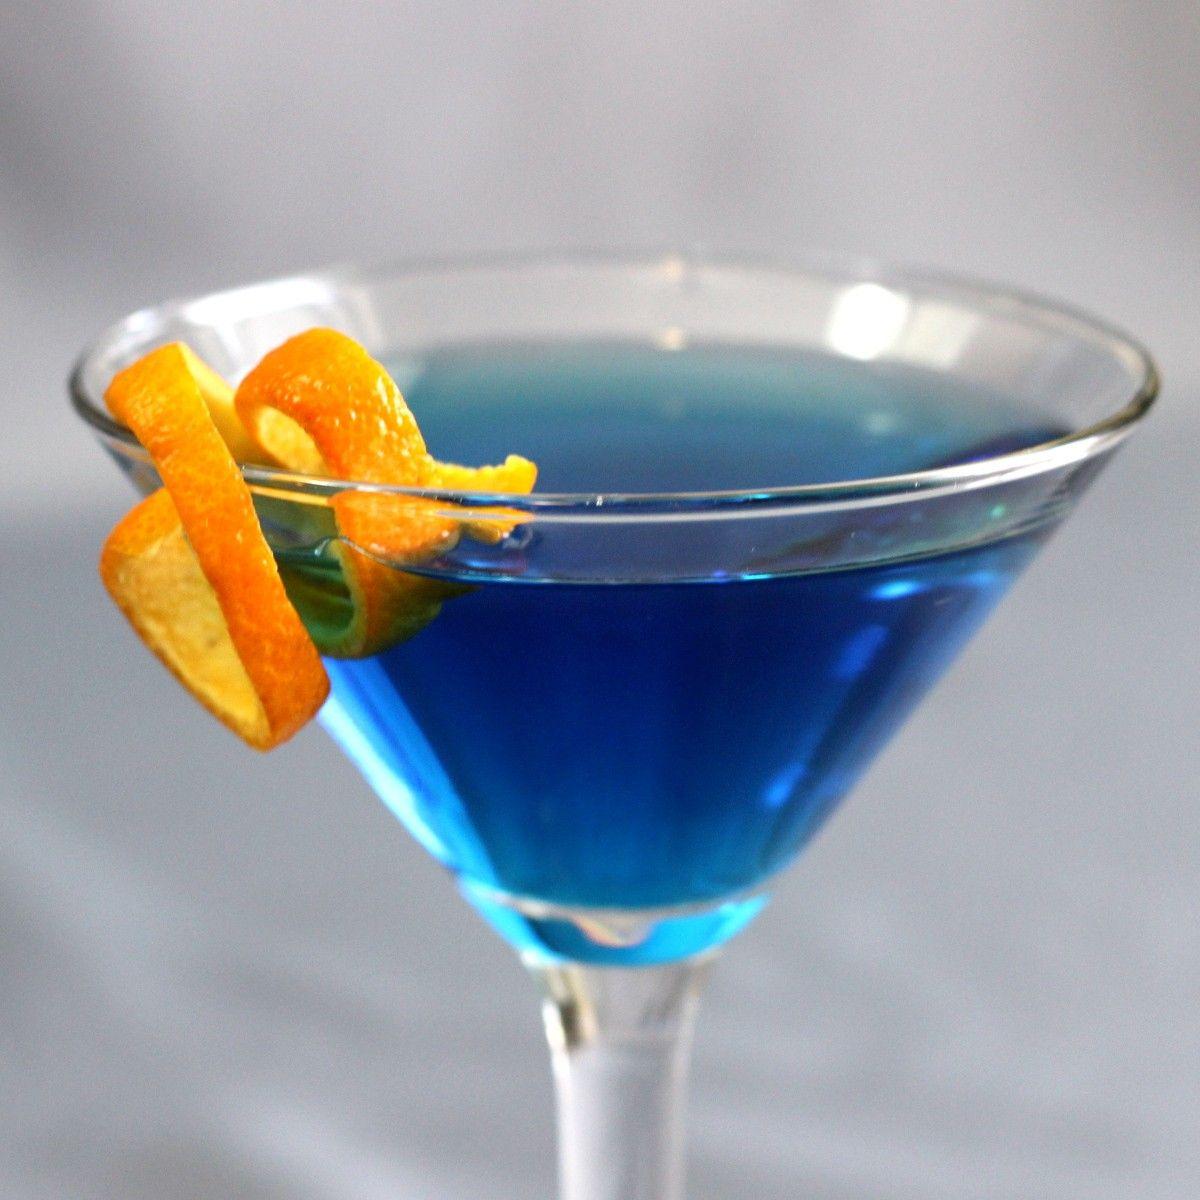 el caribe caribbean martini mix that drink. Black Bedroom Furniture Sets. Home Design Ideas